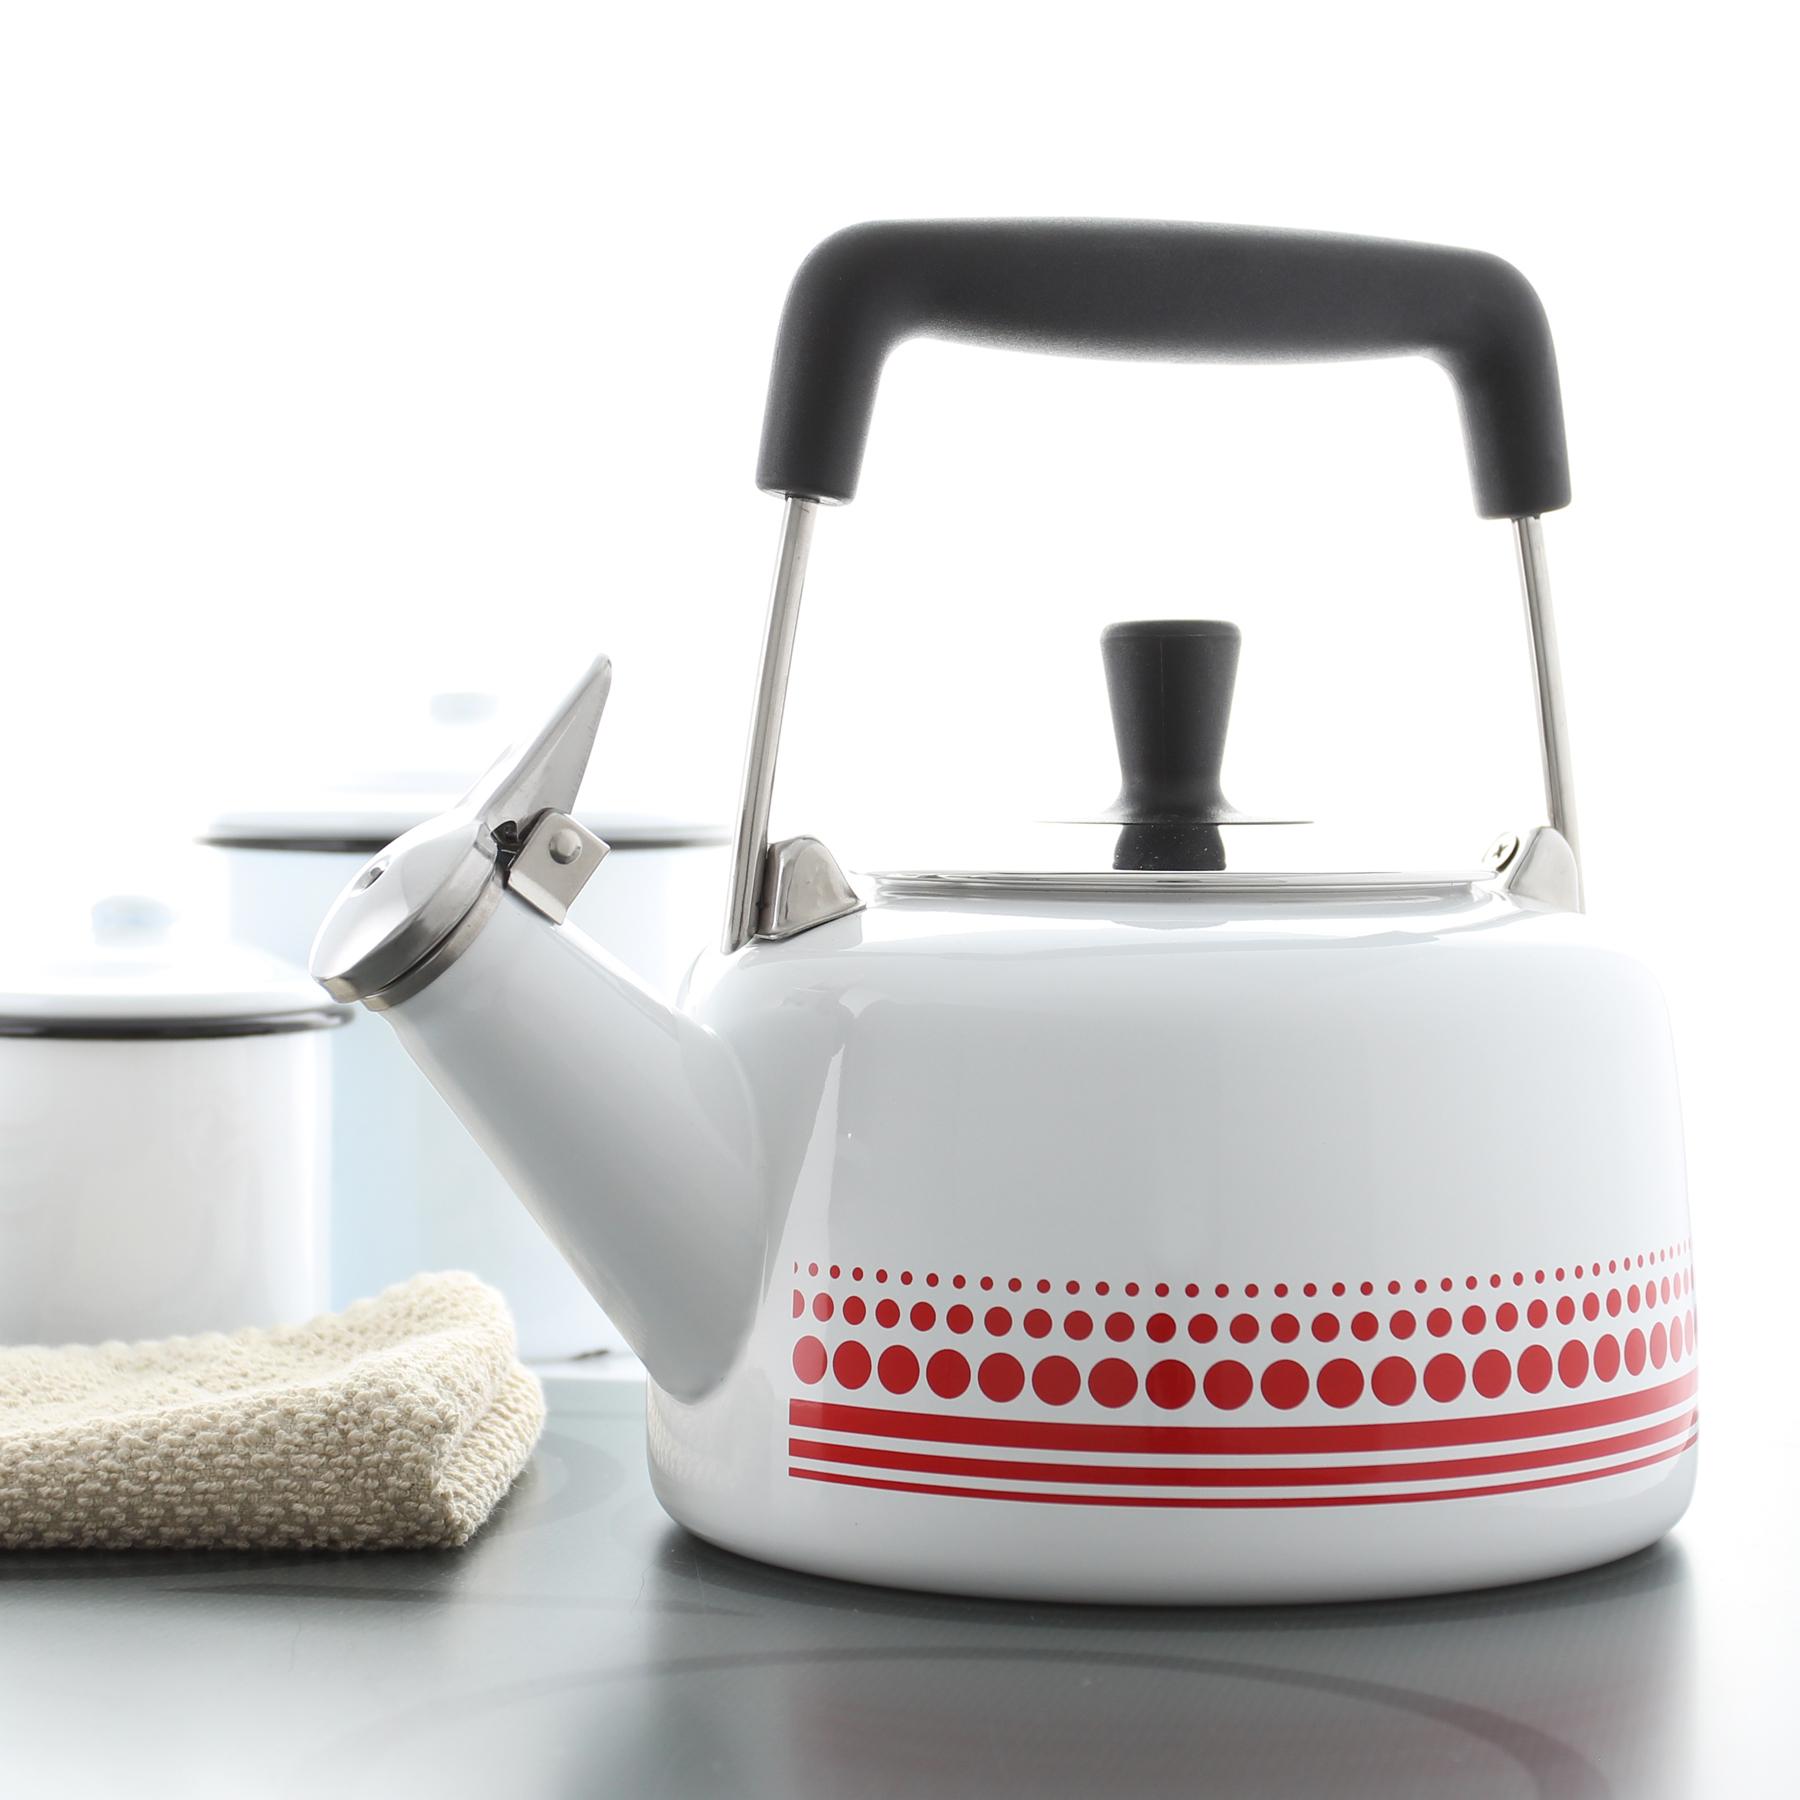 enamel on steel frieda teakettle premium white and red color